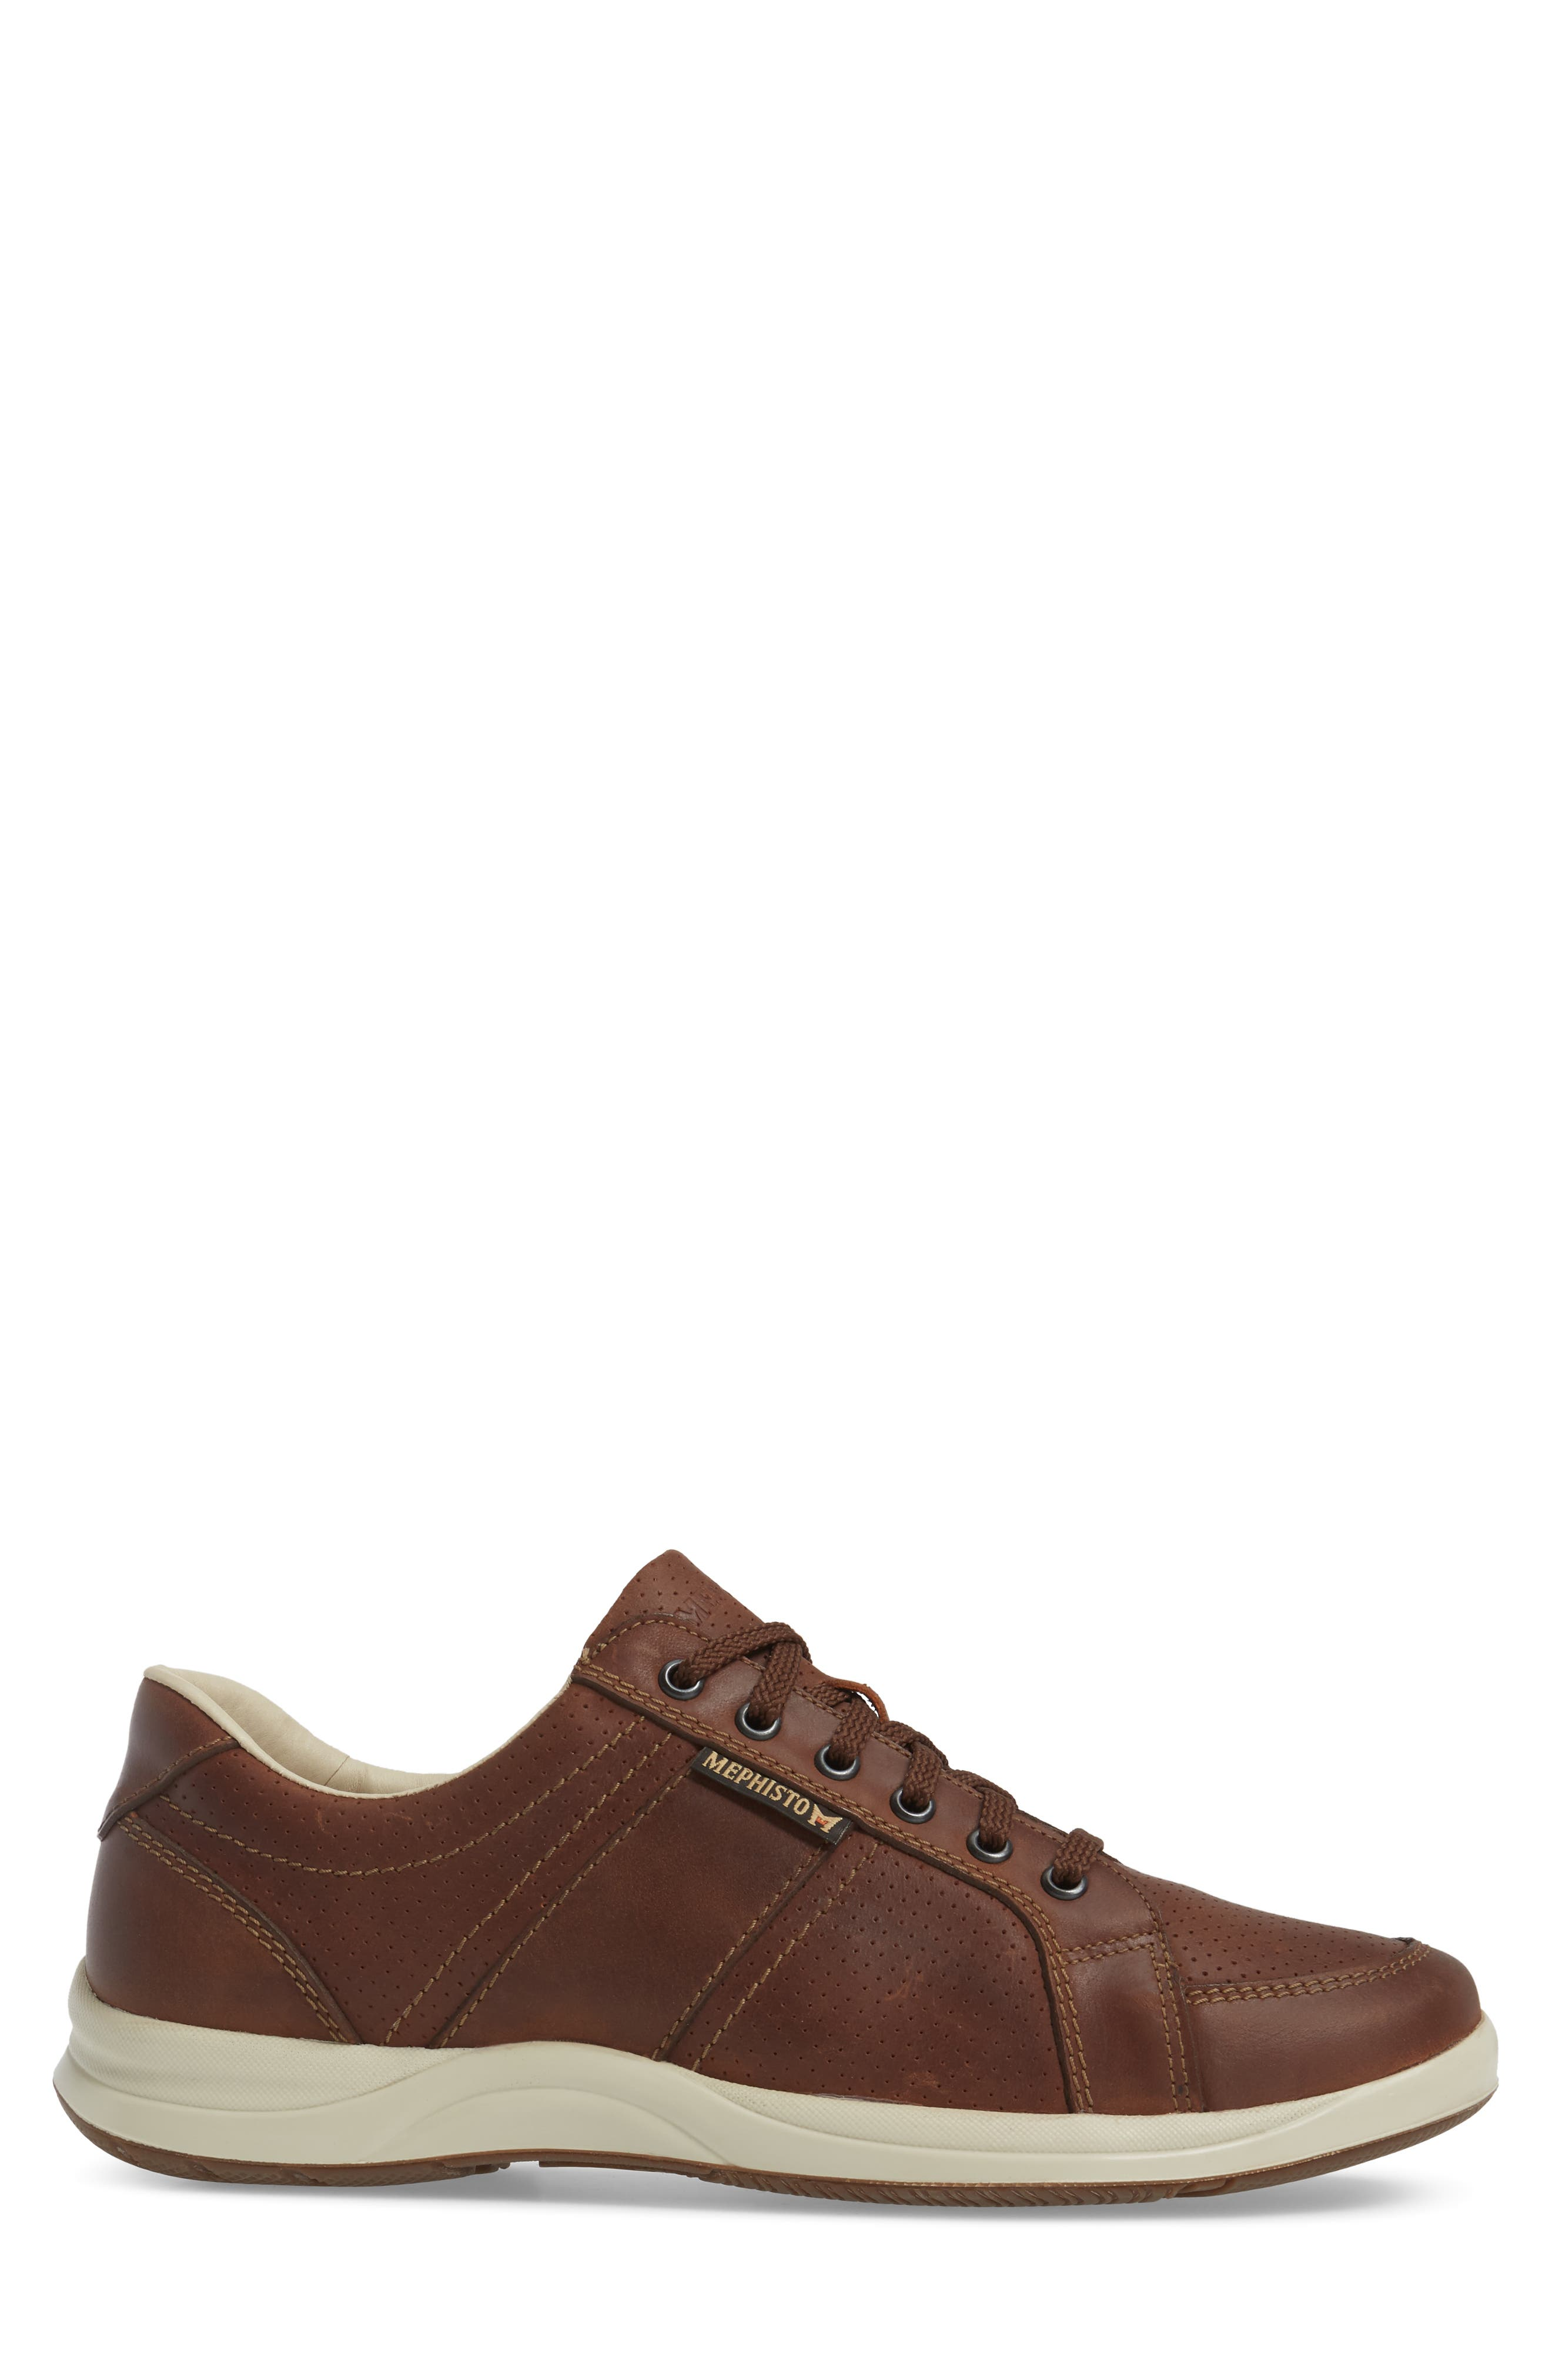 'Hero' Perforated Sneaker,                             Alternate thumbnail 3, color,                             Chestnut Nubuck Leather